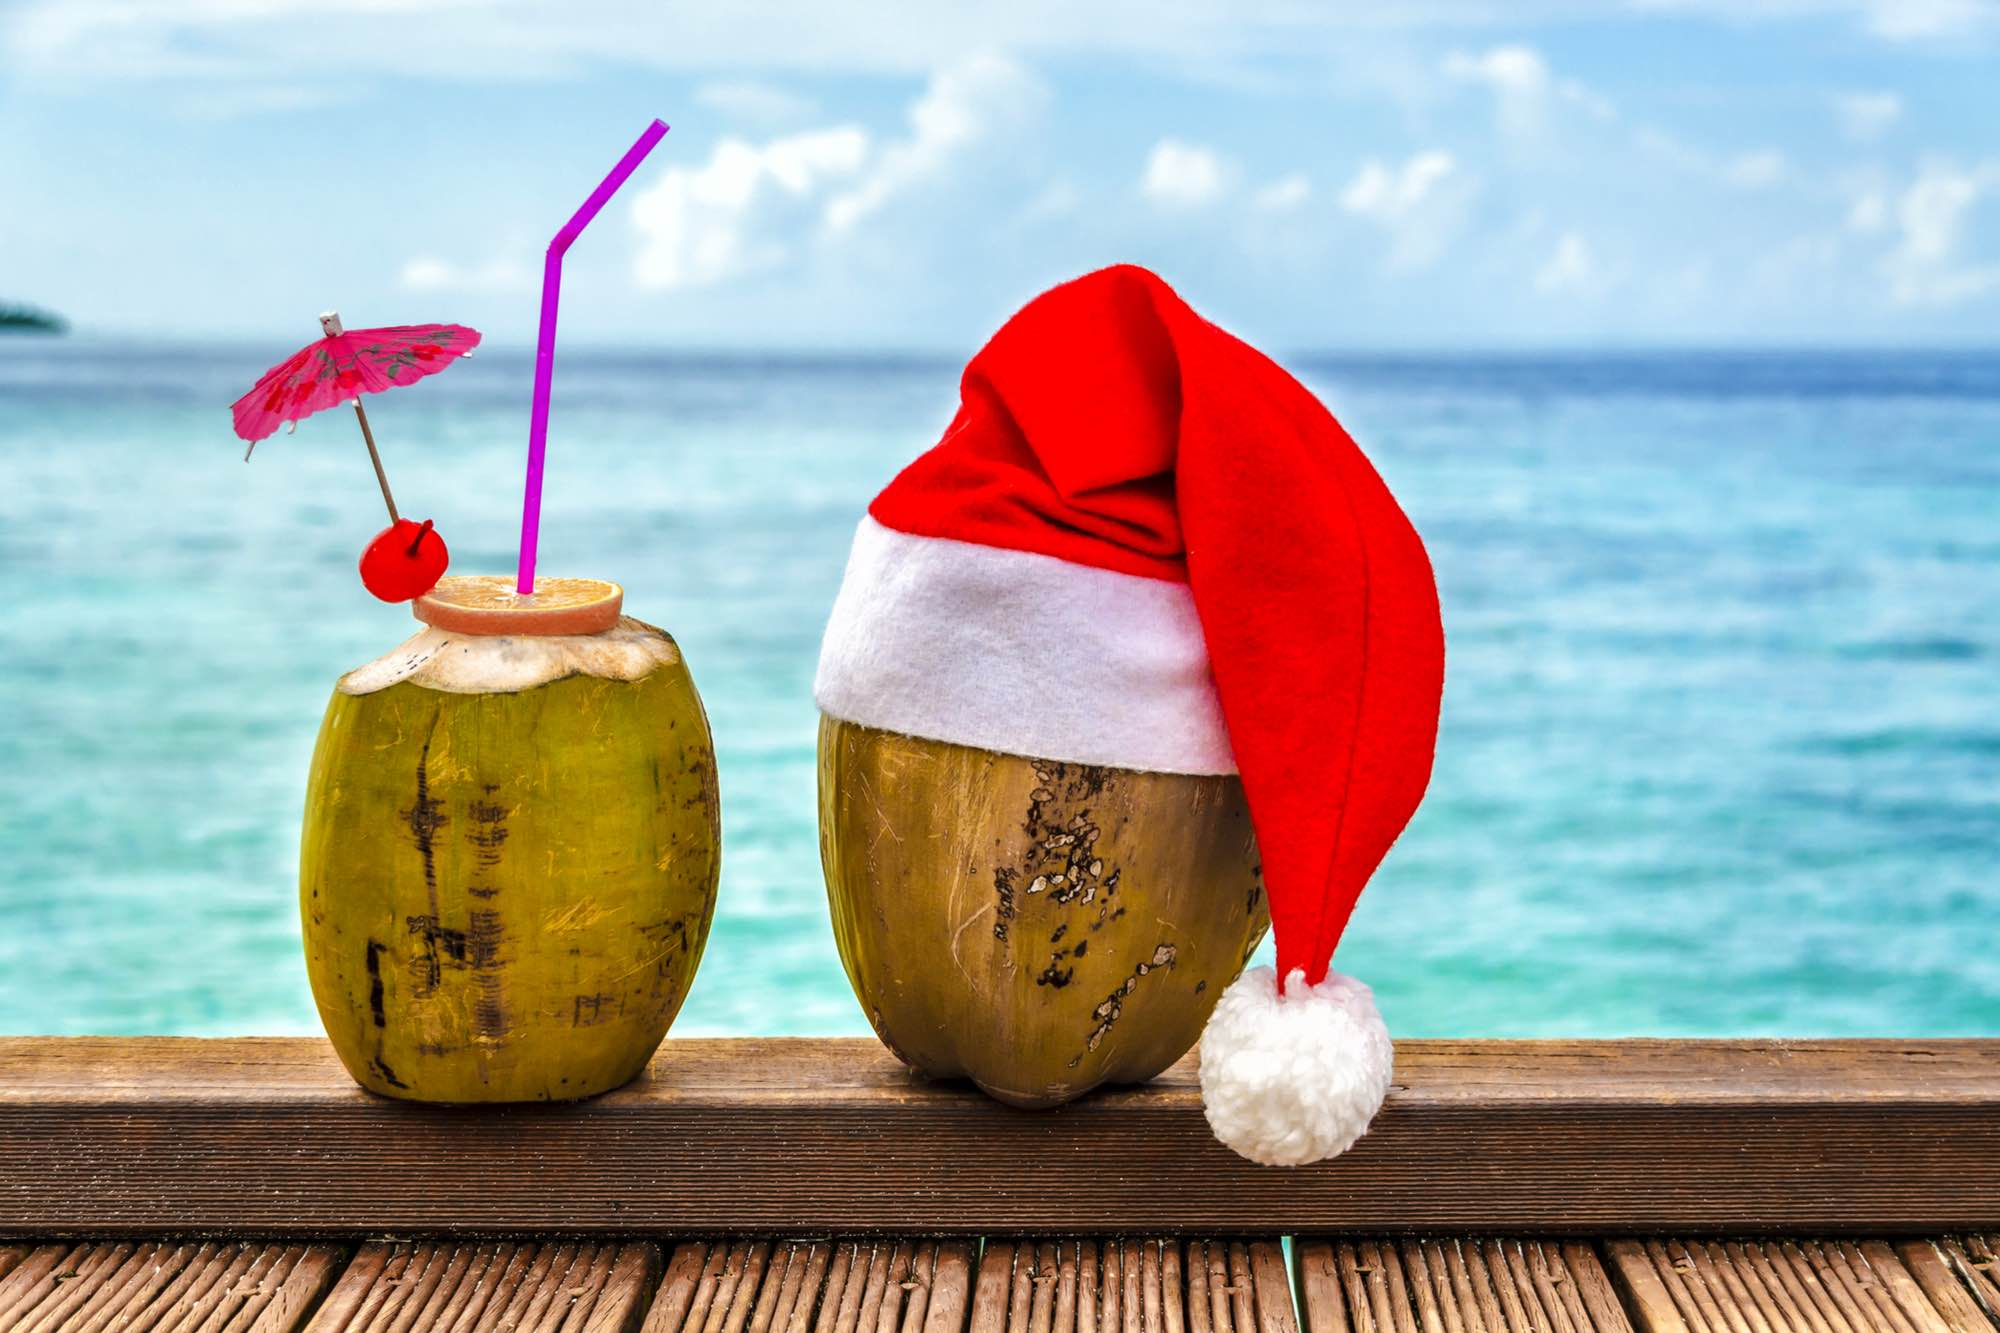 https://www.ministryofvillas.com/wp-content/uploads/2017/12/bali-christmas-coconuts.jpg